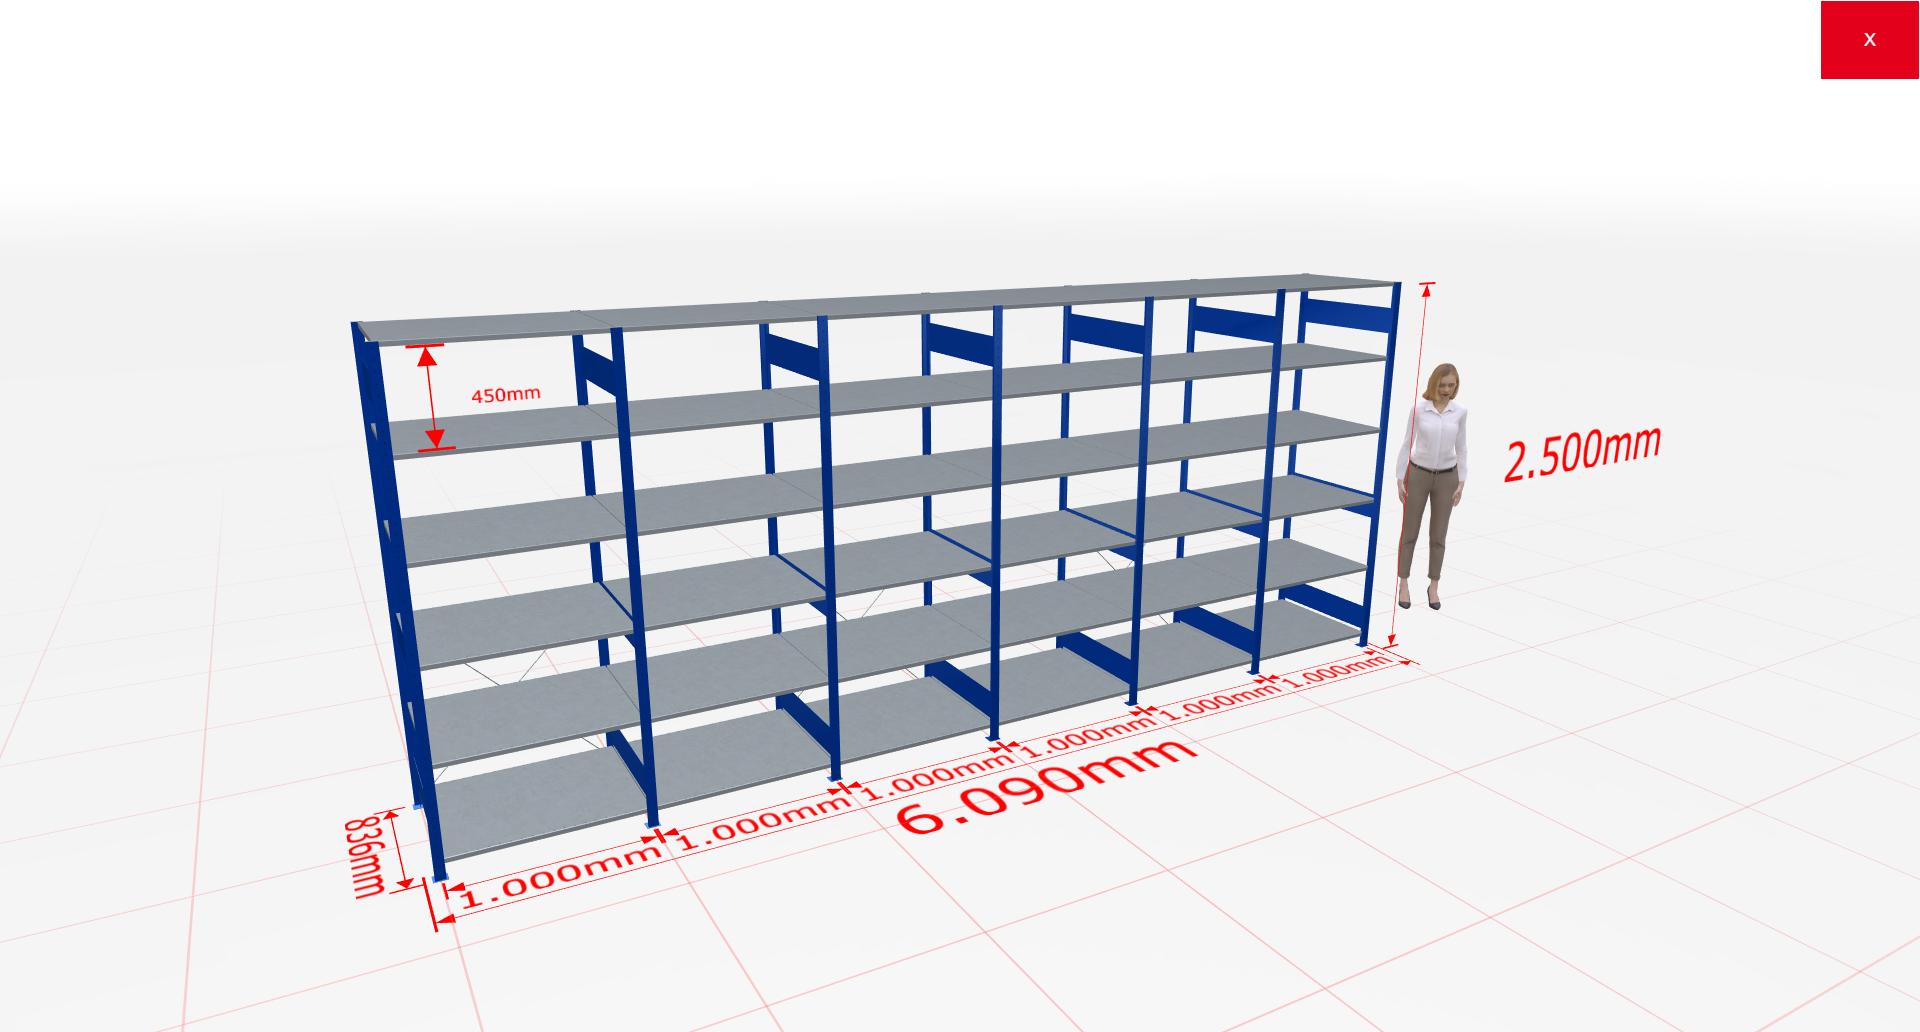 Fachbodenregal Komplettregal 2500x6090x800 mm (HxBxT) SCHULTE Lagertechnik blau 6 Ebenen  150 kg je Boden